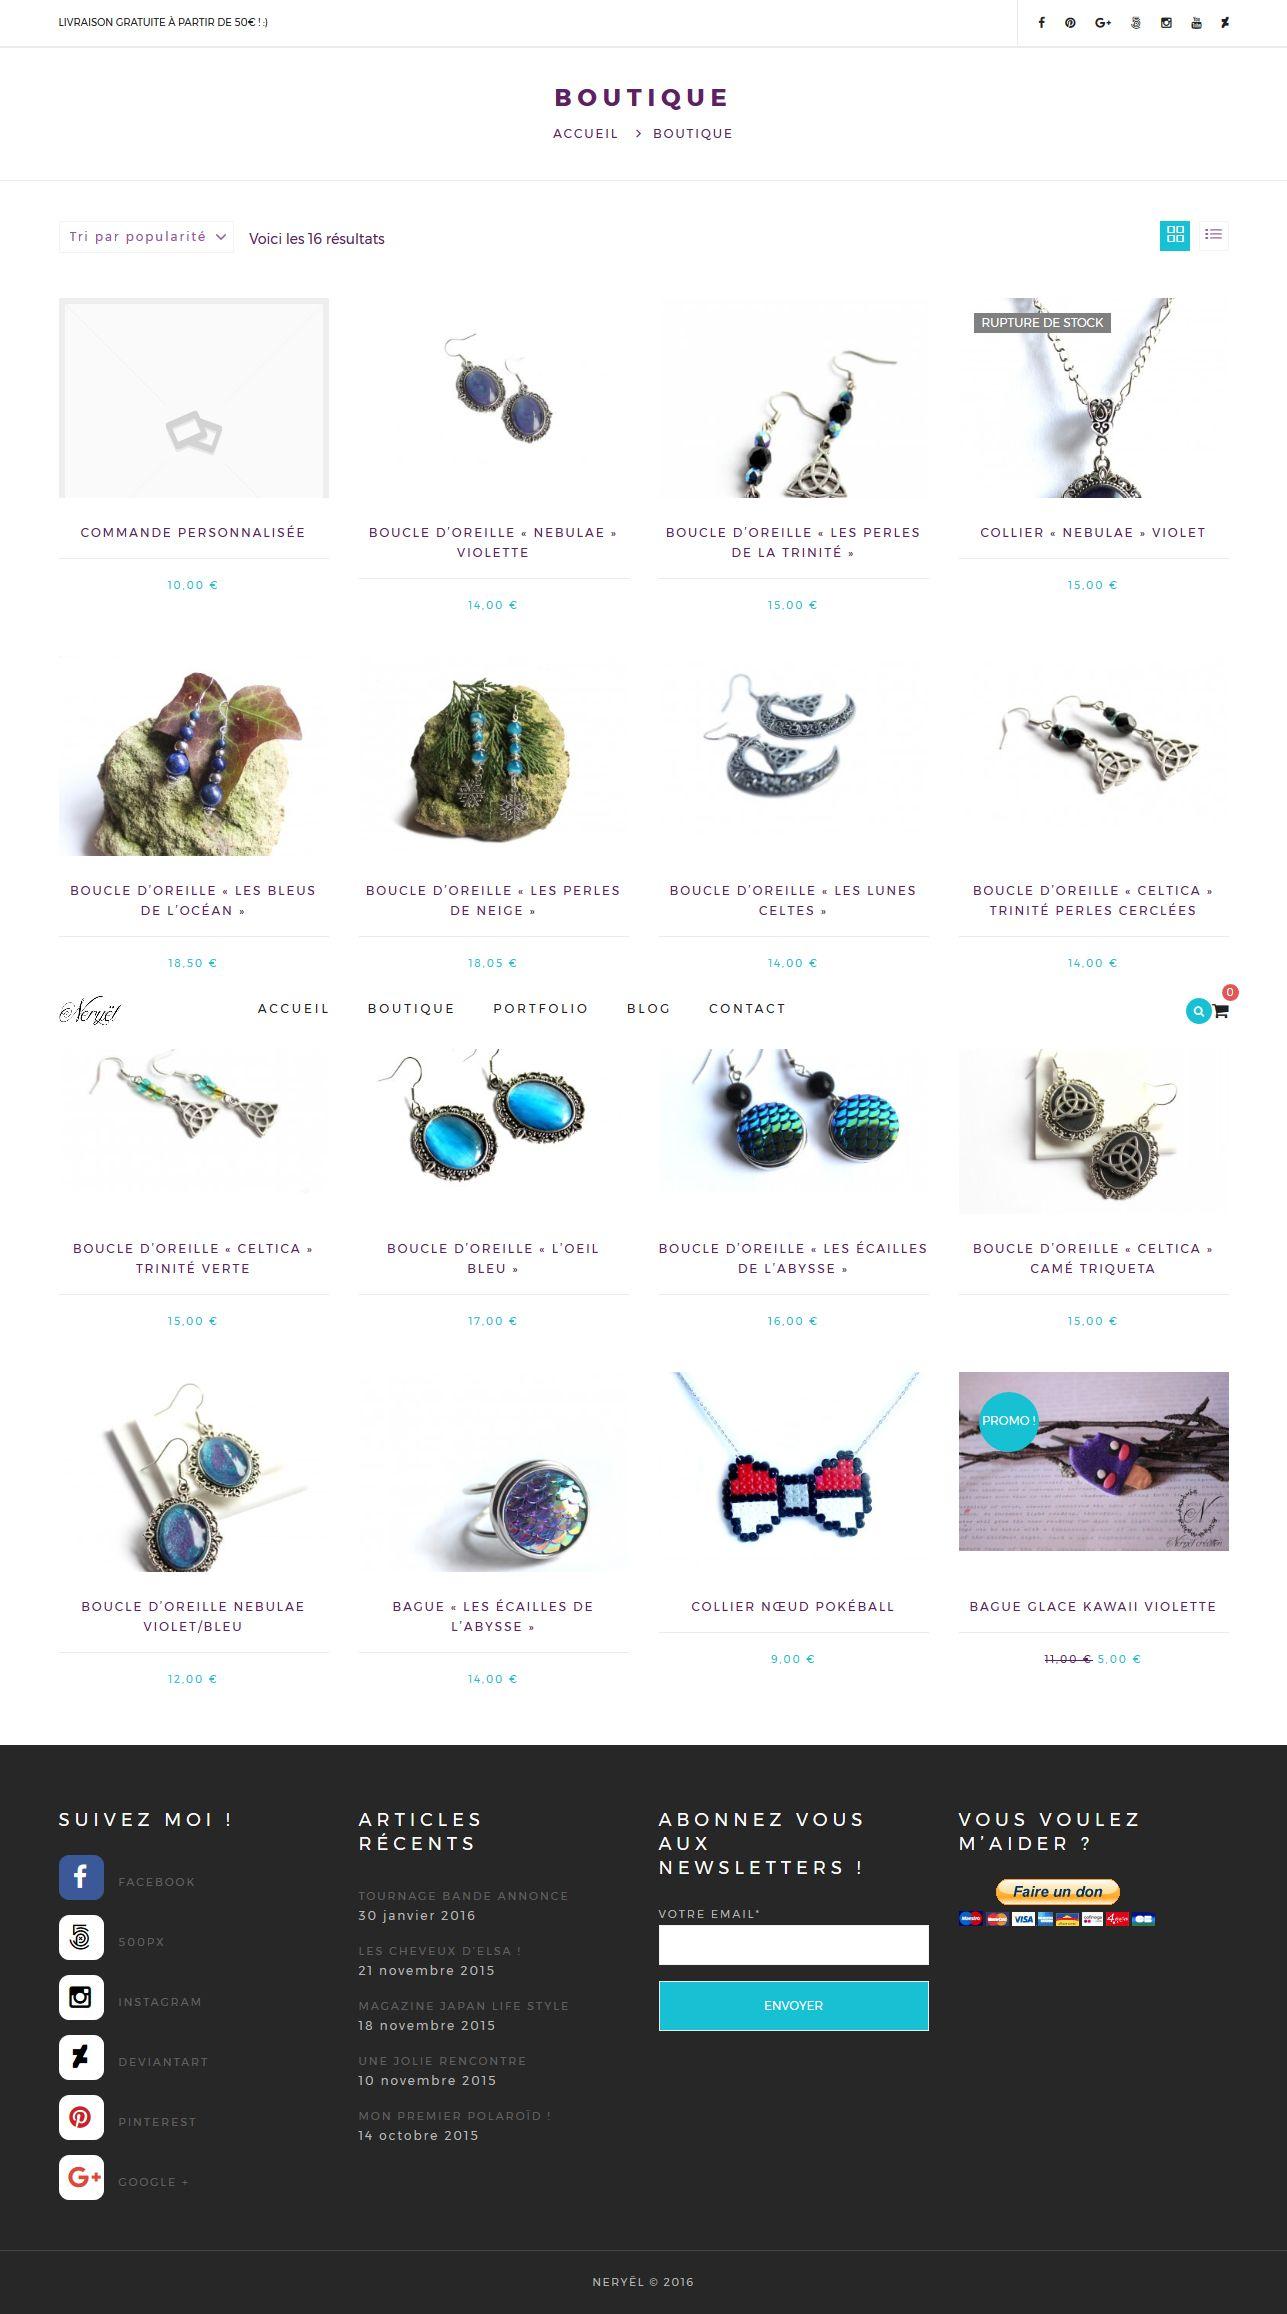 neryel mannequin modele creatrice de bijou site commerce concu par geekarts3